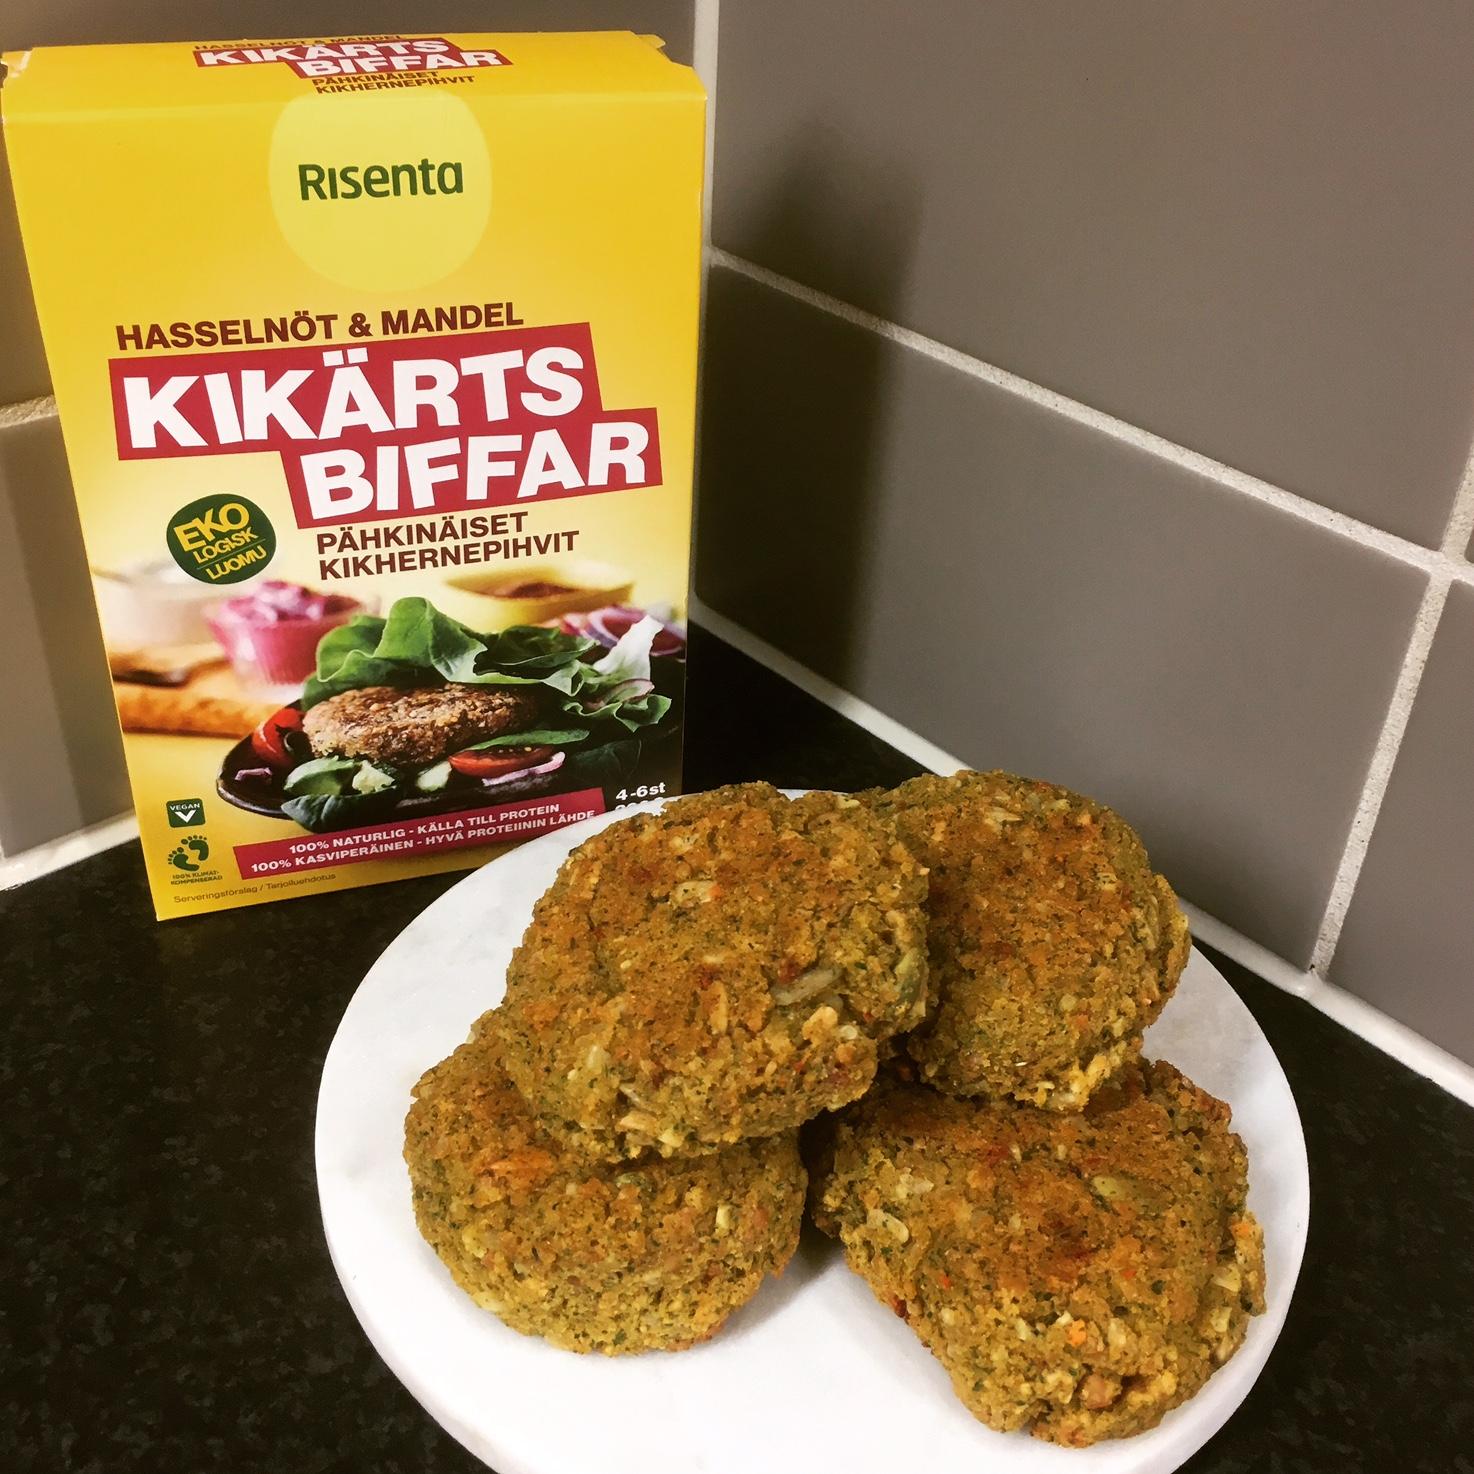 Risenta Kikärtsbiffar Hasselnöt & Mandel